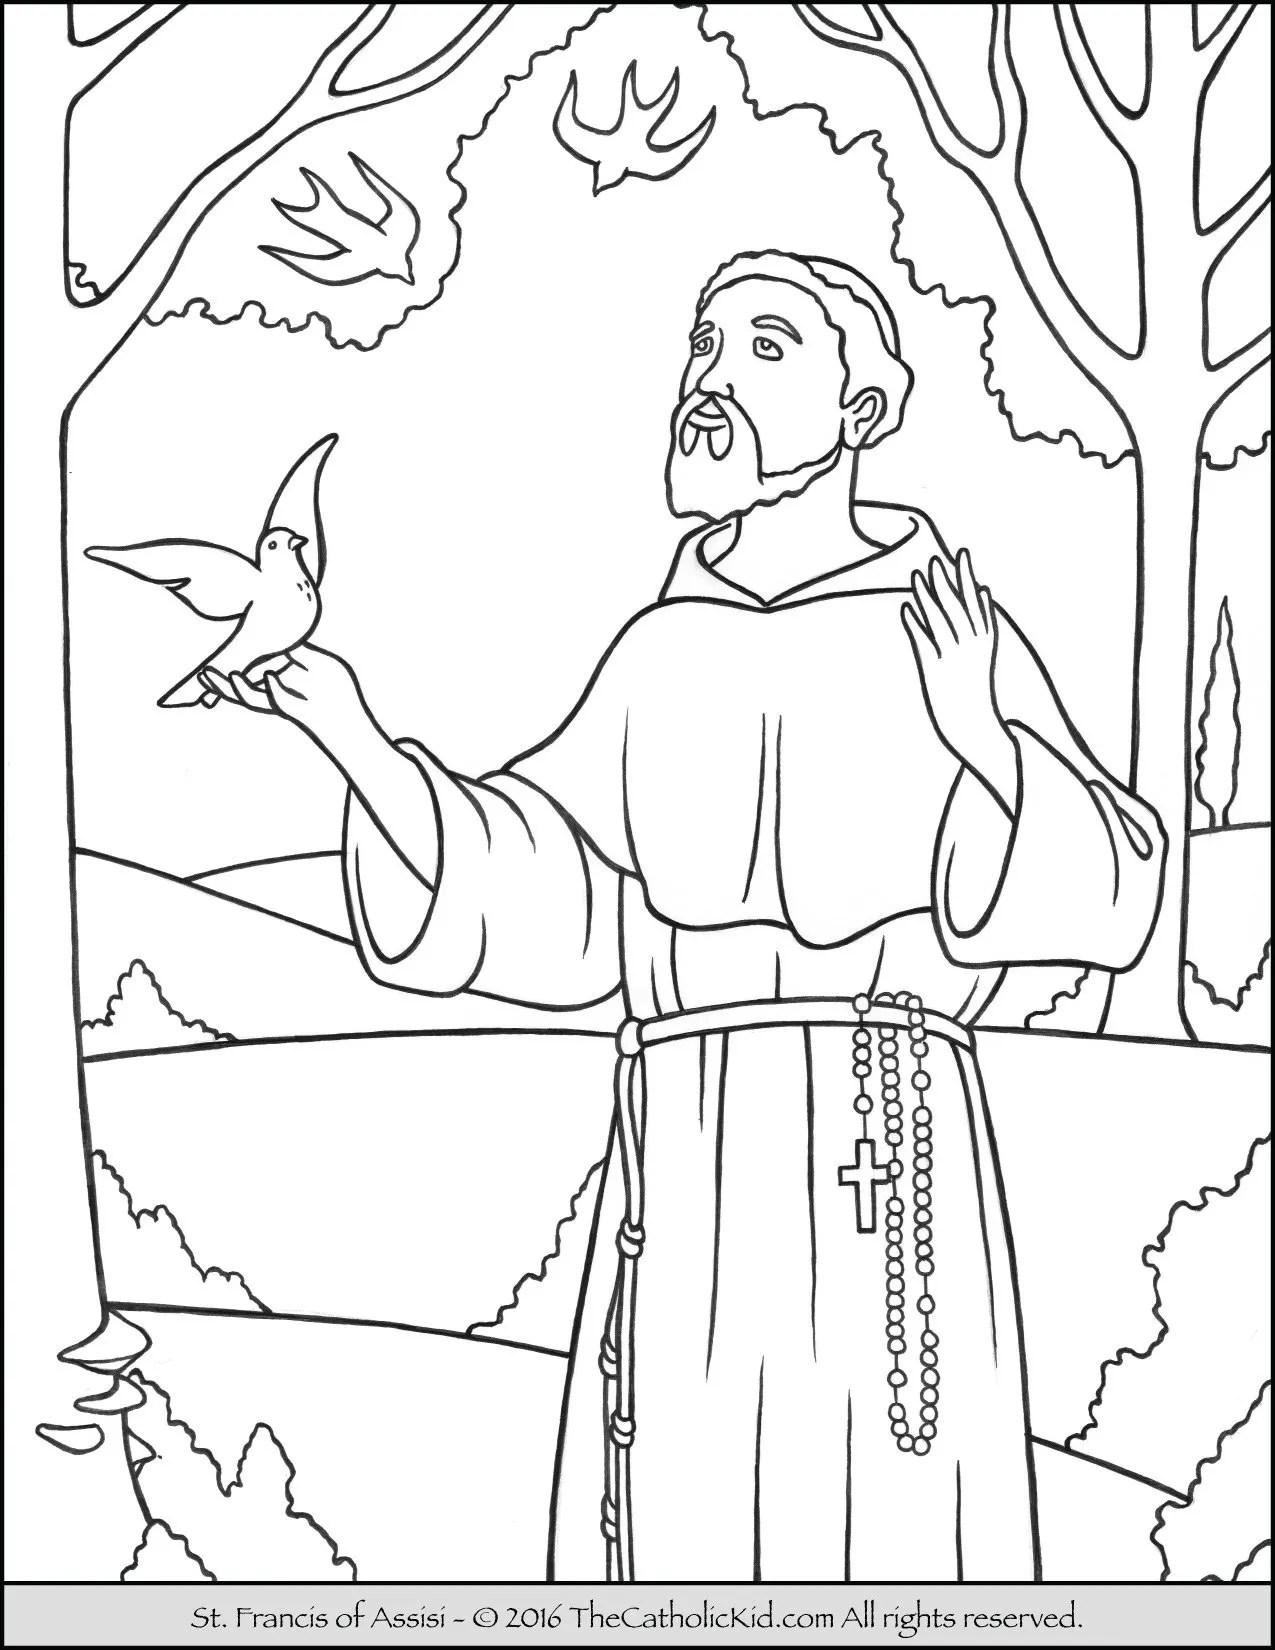 Catholic Saints Coloring Pages : catholic, saints, coloring, pages, Saint, Francis, Coloring